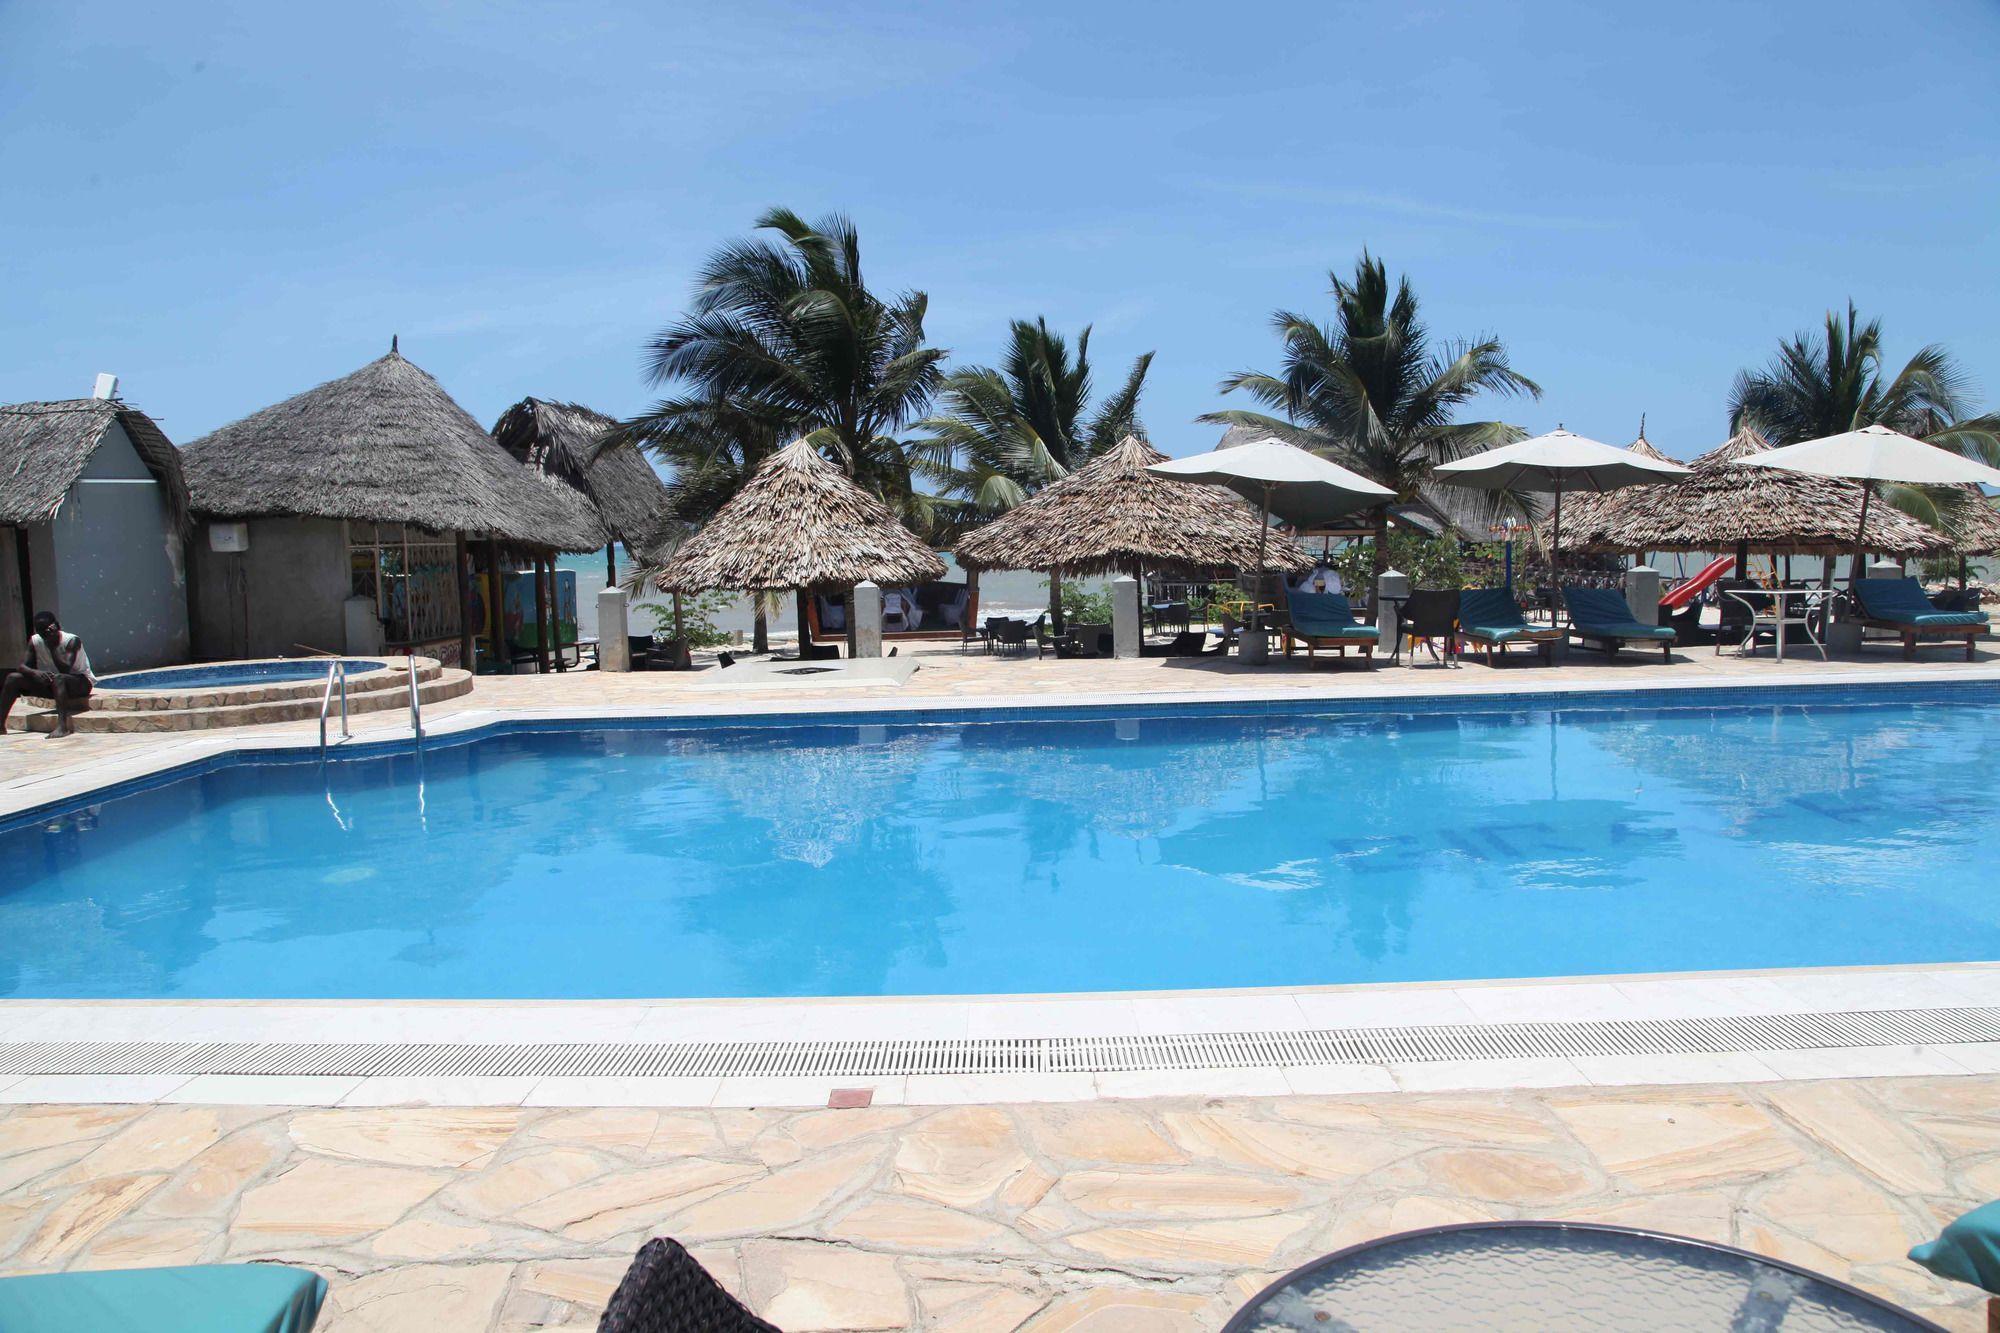 Giraffe Ocean View hotel dar es salaam 67